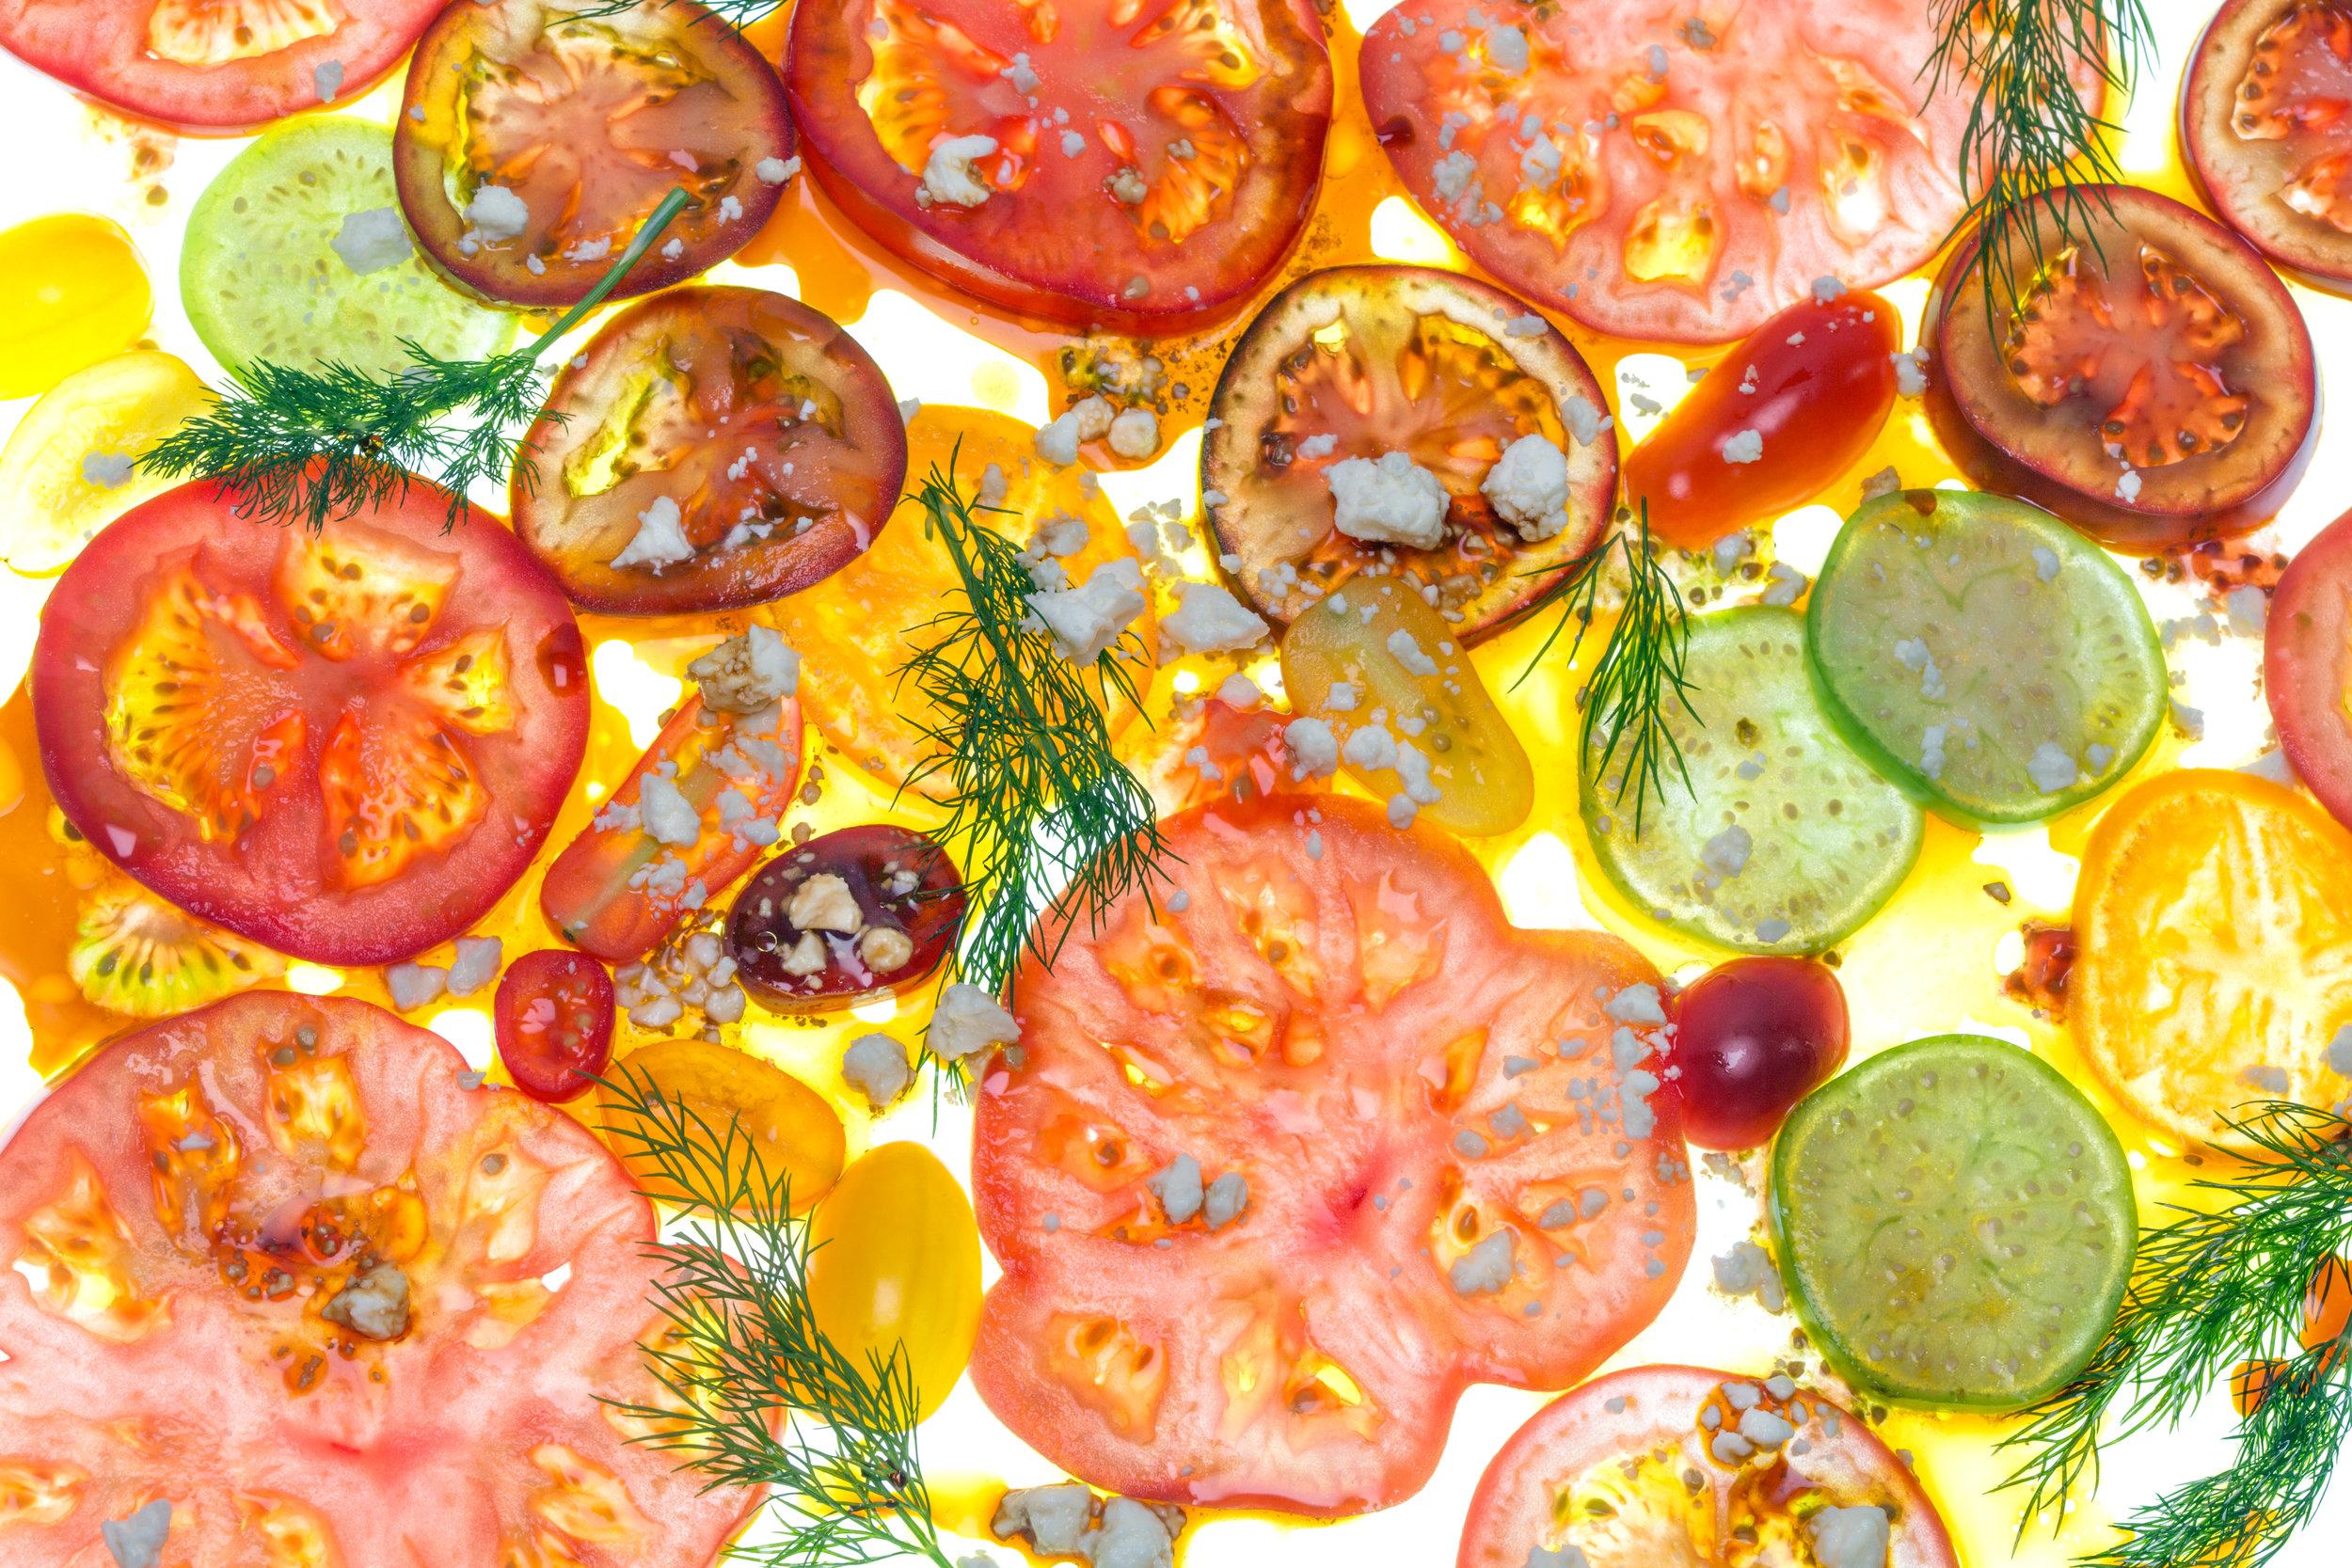 20160607-tomato_salad-1548.jpg